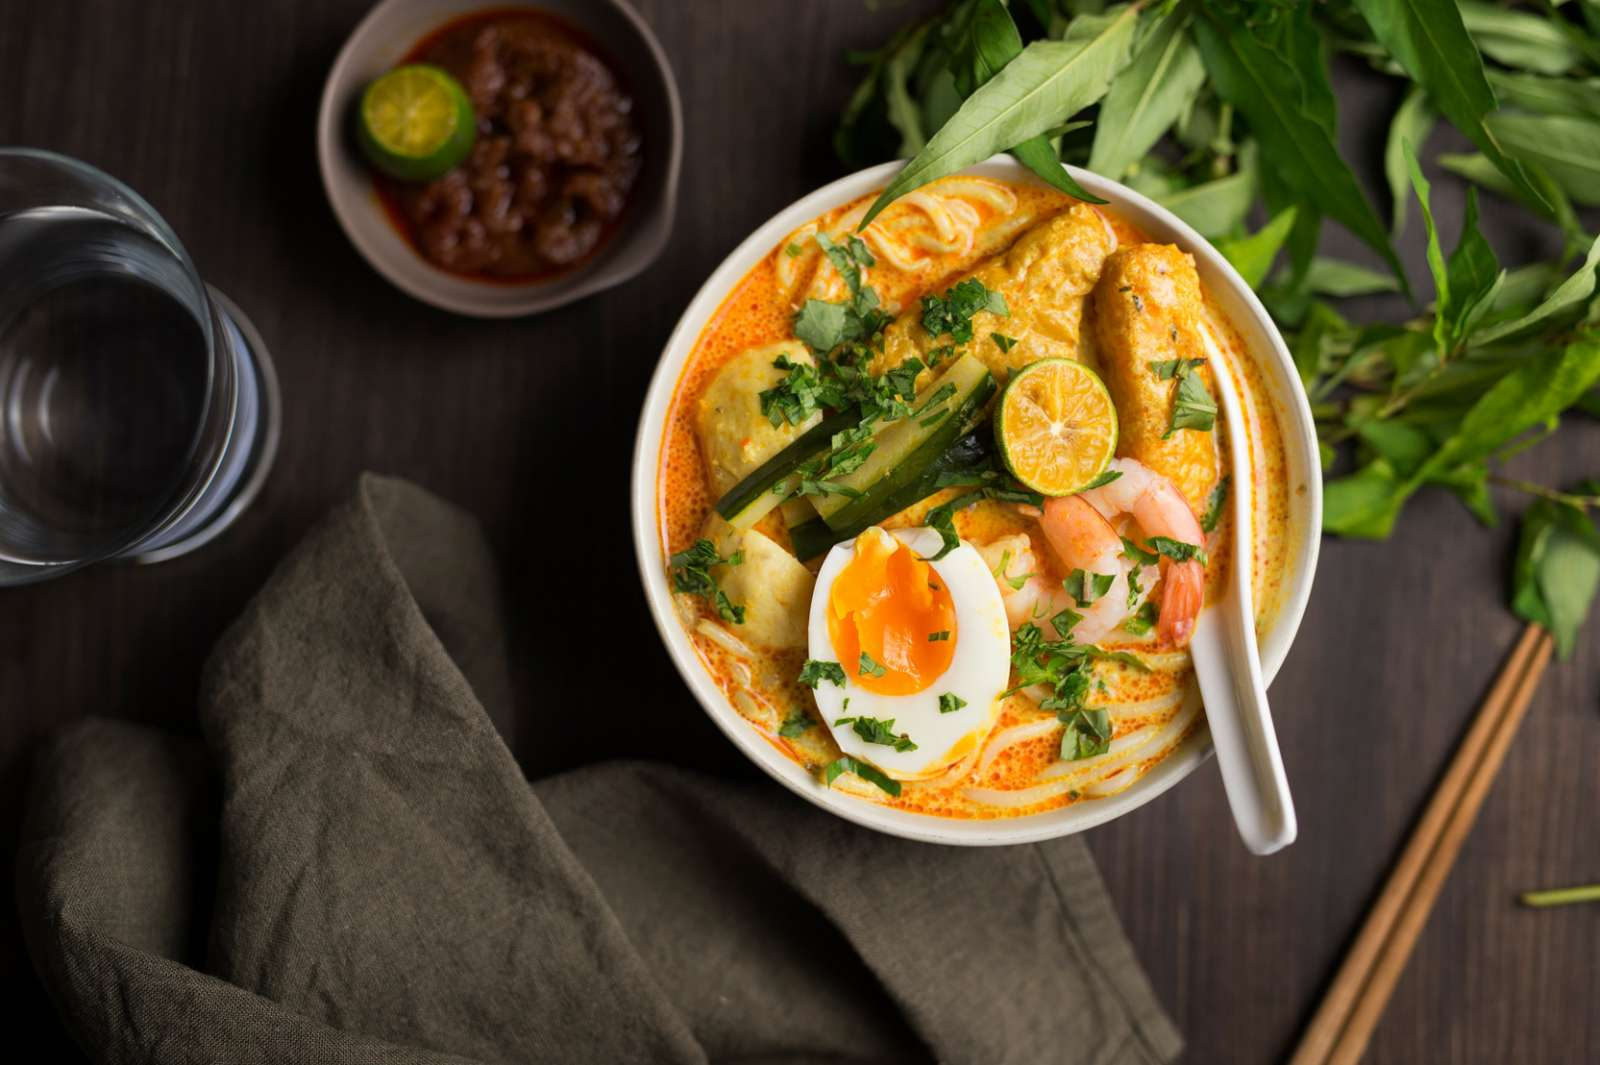 Buy Singapore Curry Laksa Paste (Concentrate) • Latasha's ...